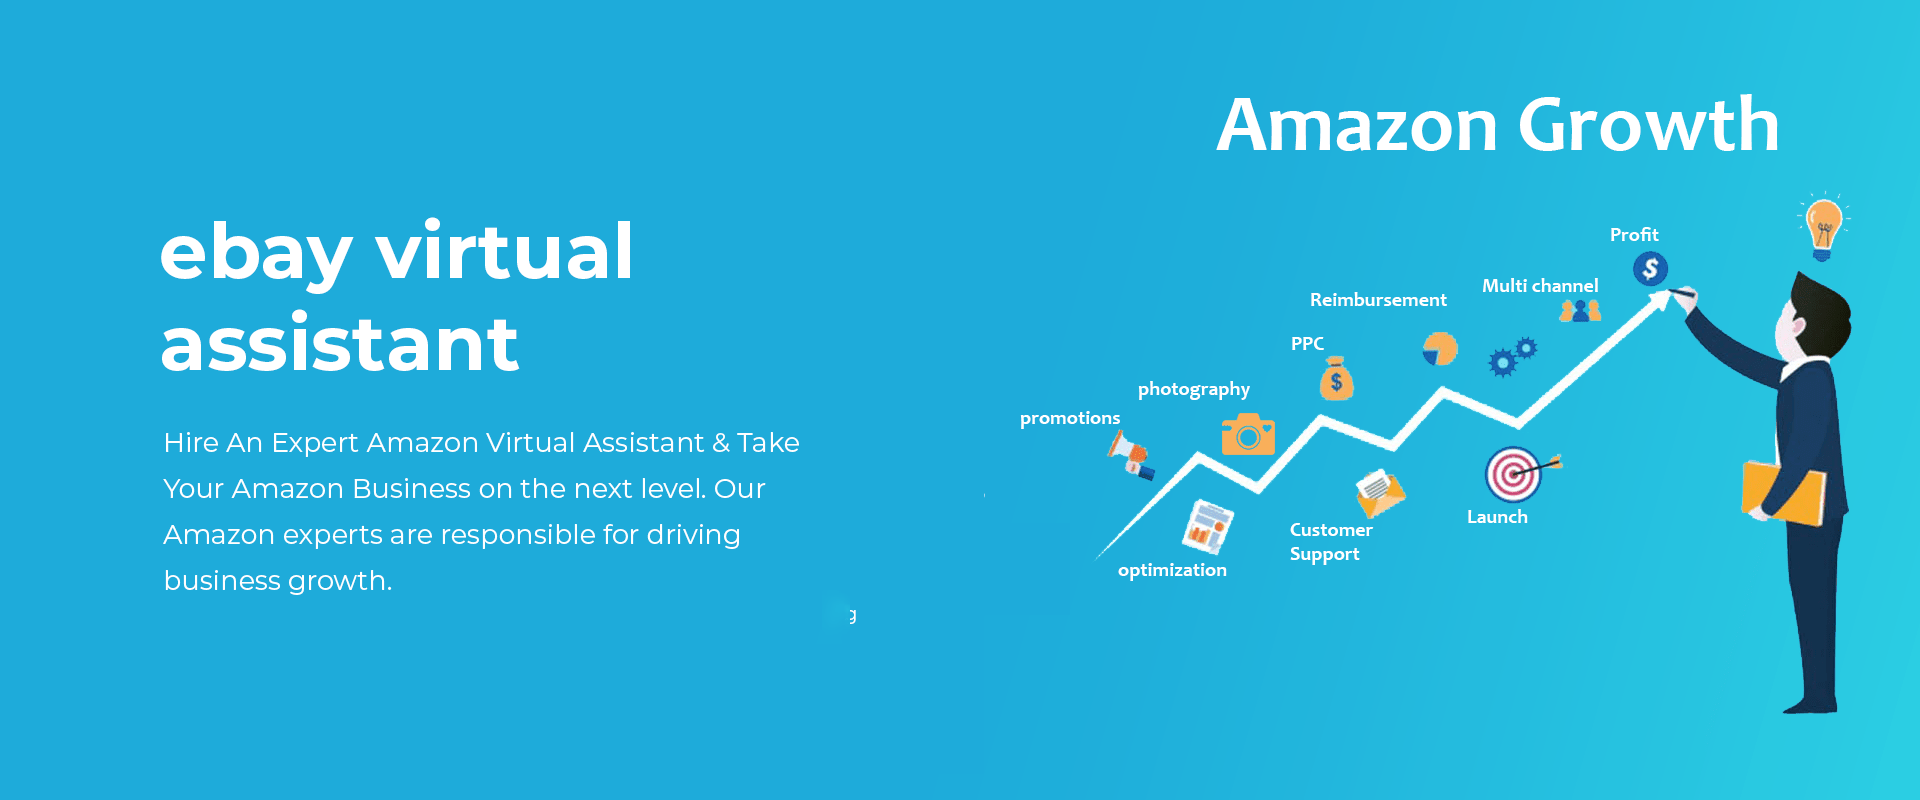 ebay virtual assistant